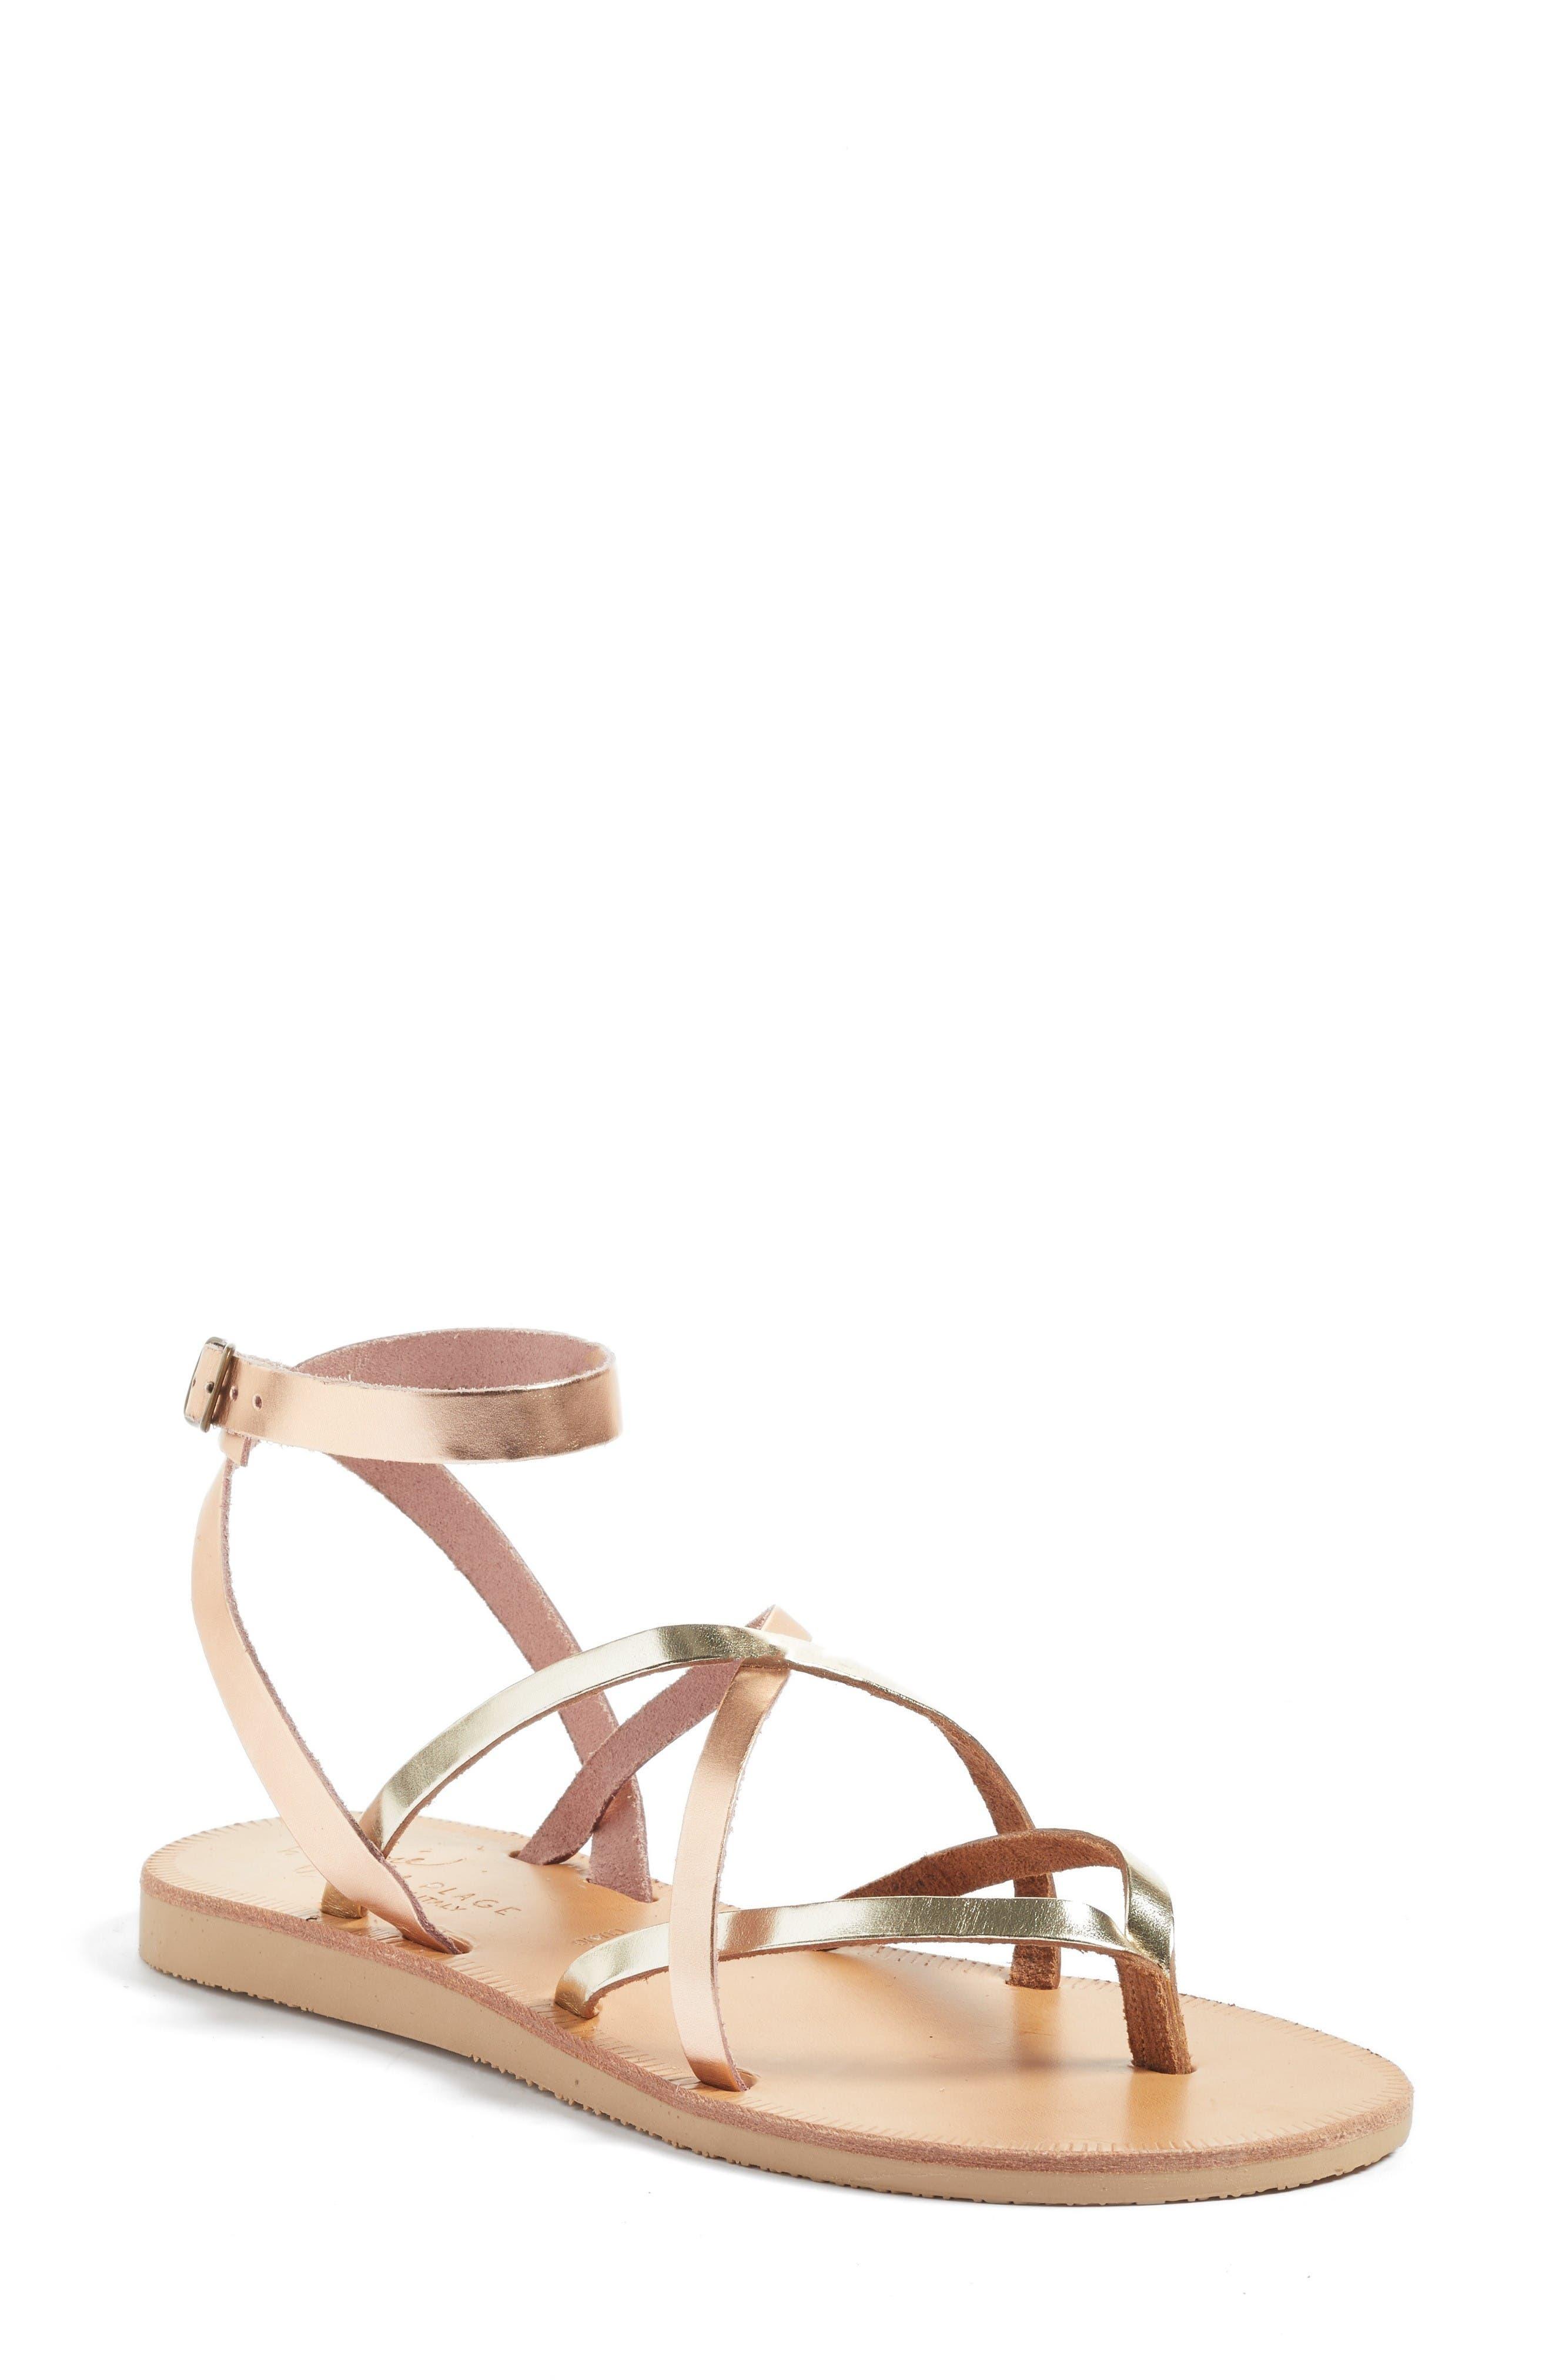 Alternate Image 1 Selected - Joie 'Oda' Flat Sandal (Women)